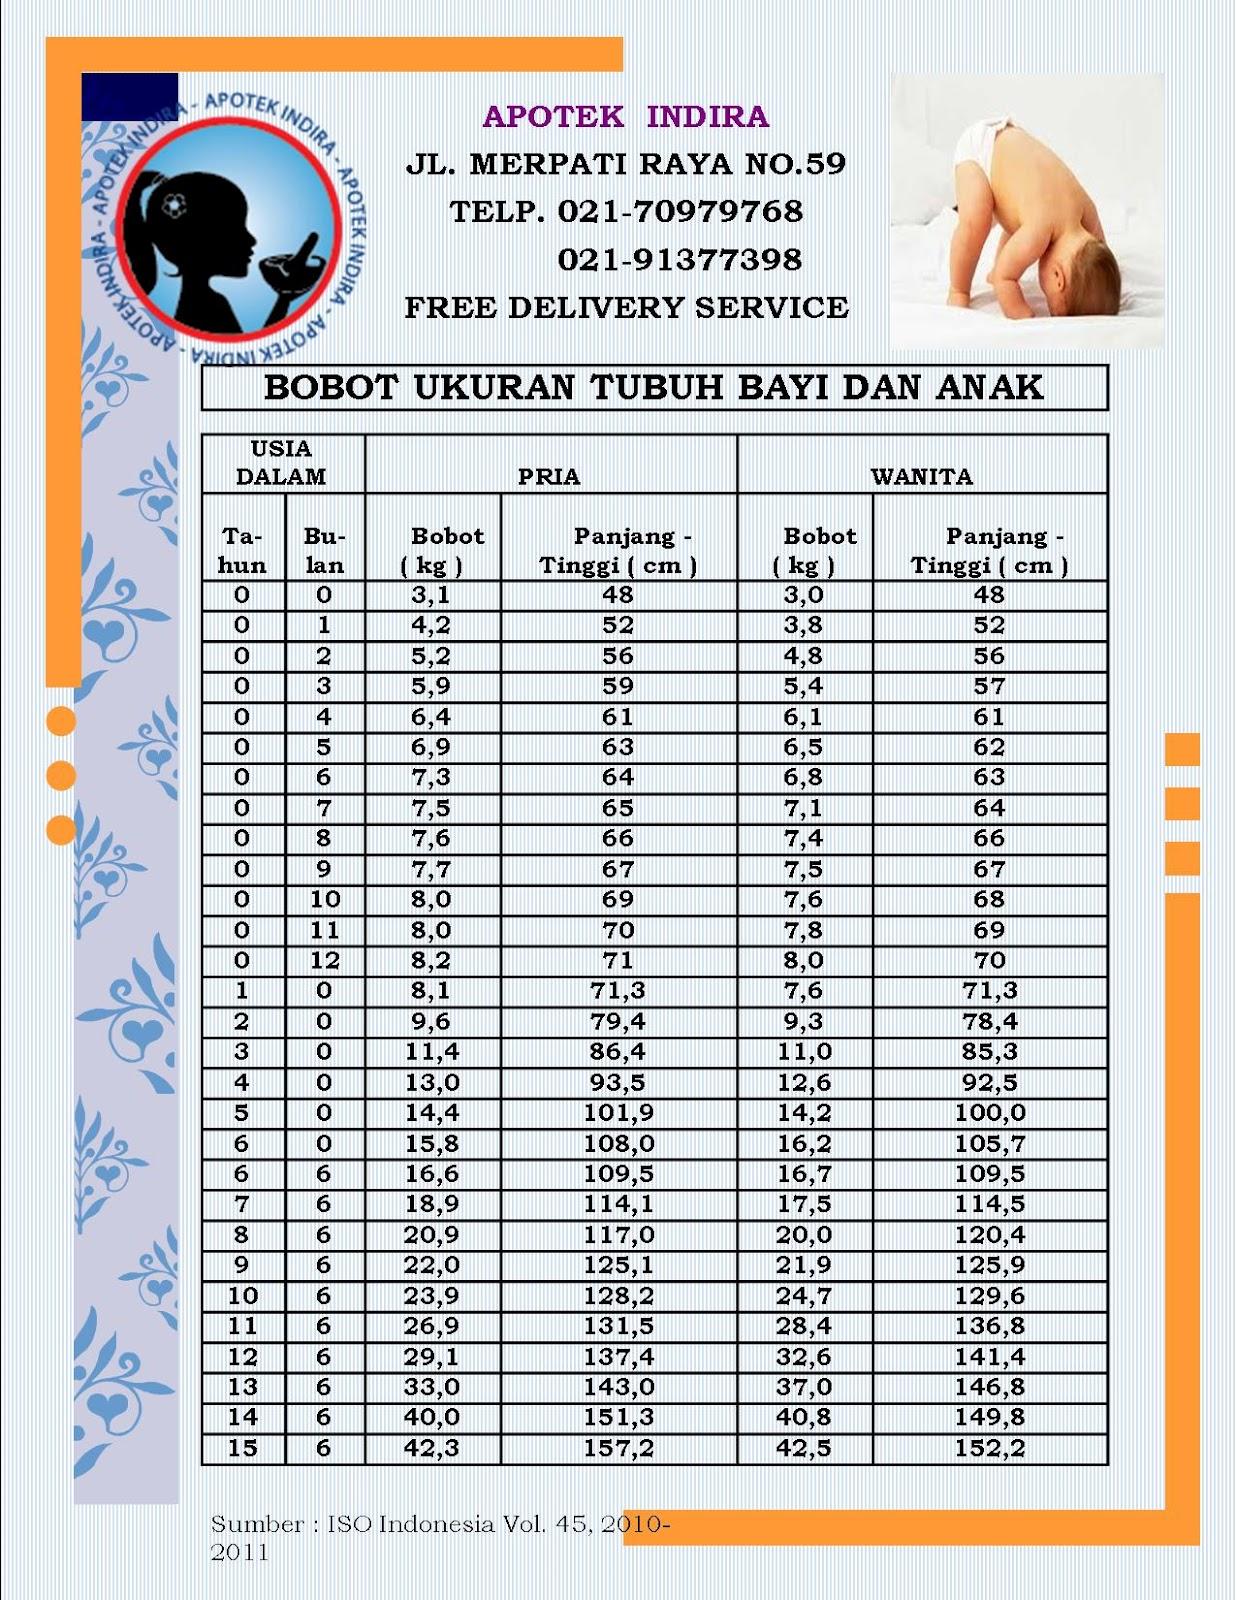 Rata Rata Bobot Ukuran Tubuh Bayi Dan Anak